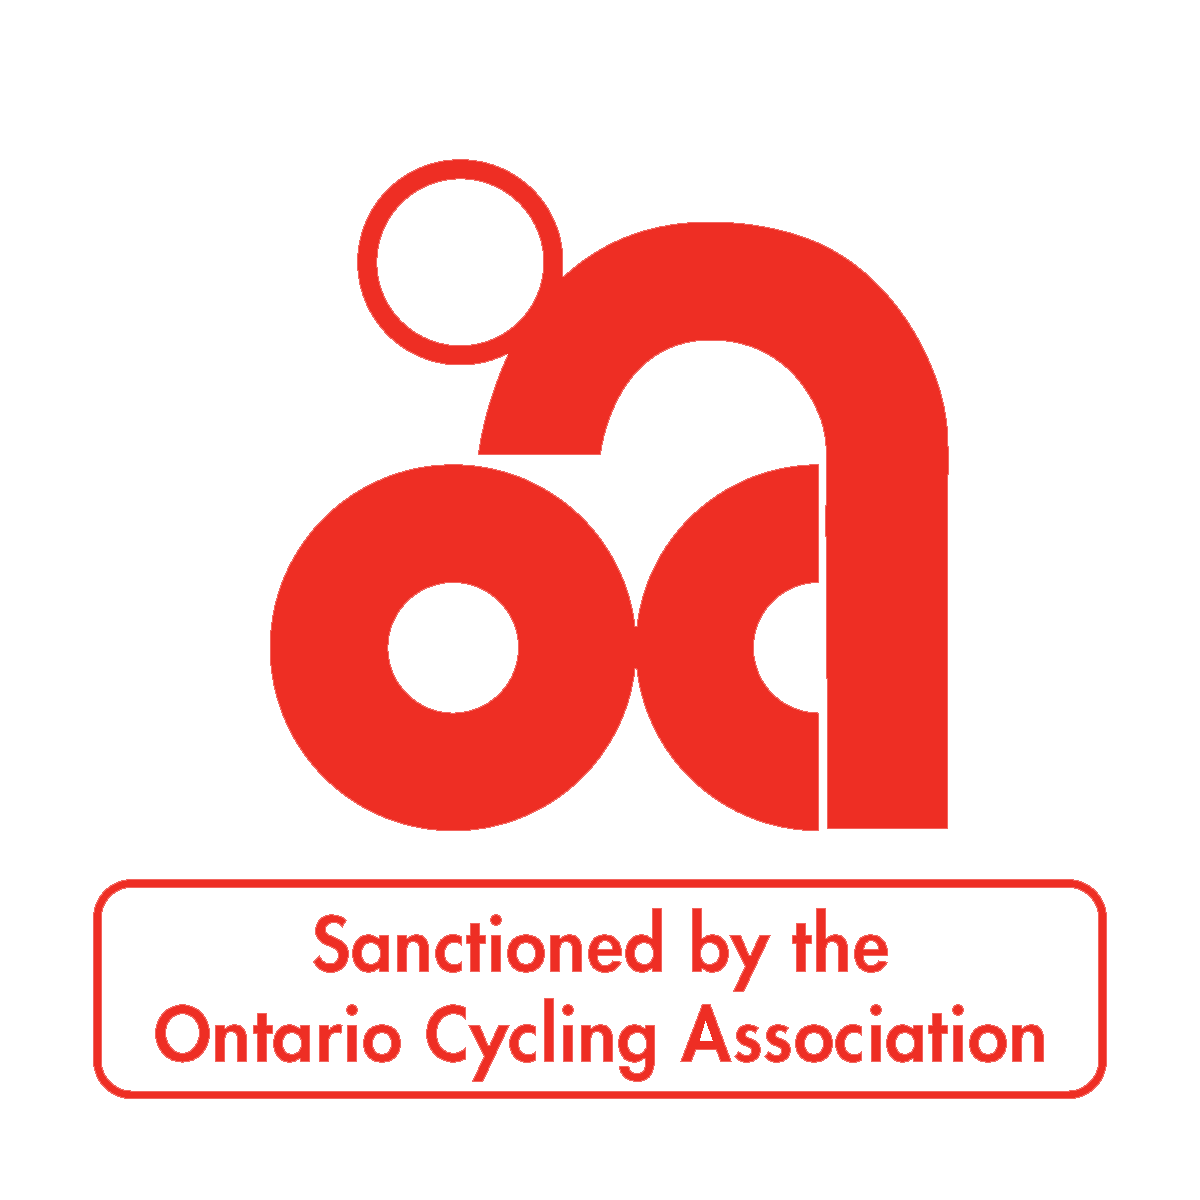 OCA - SANCTIONEDR